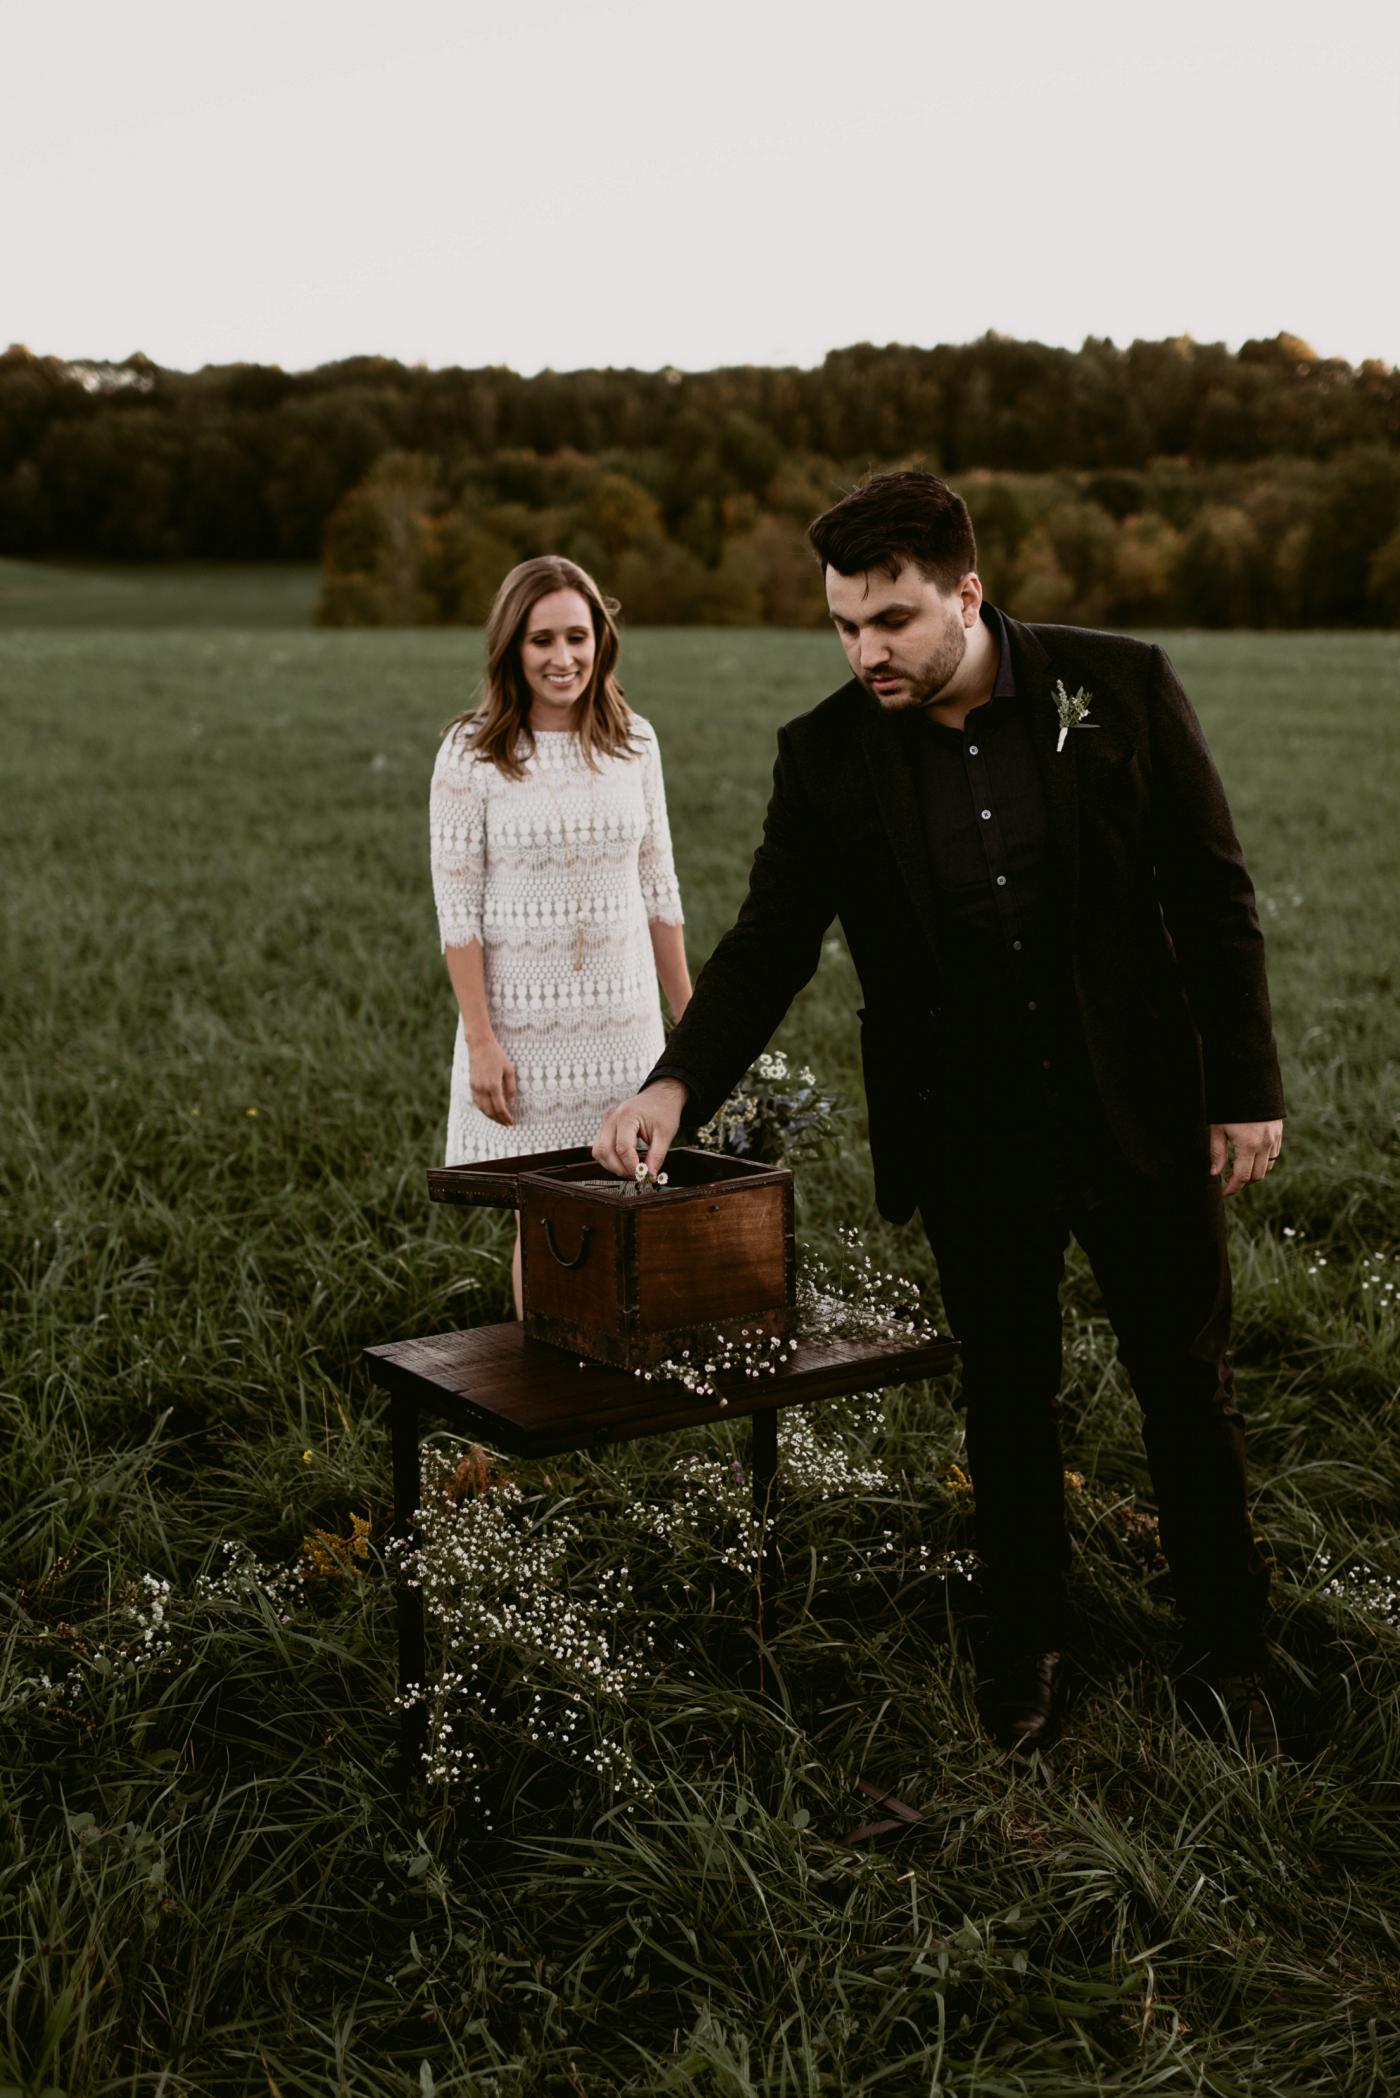 Wildflower-Field-Elopement-Vow-Renewal_Lisa+Chad_MJPHOTO-227.JPG